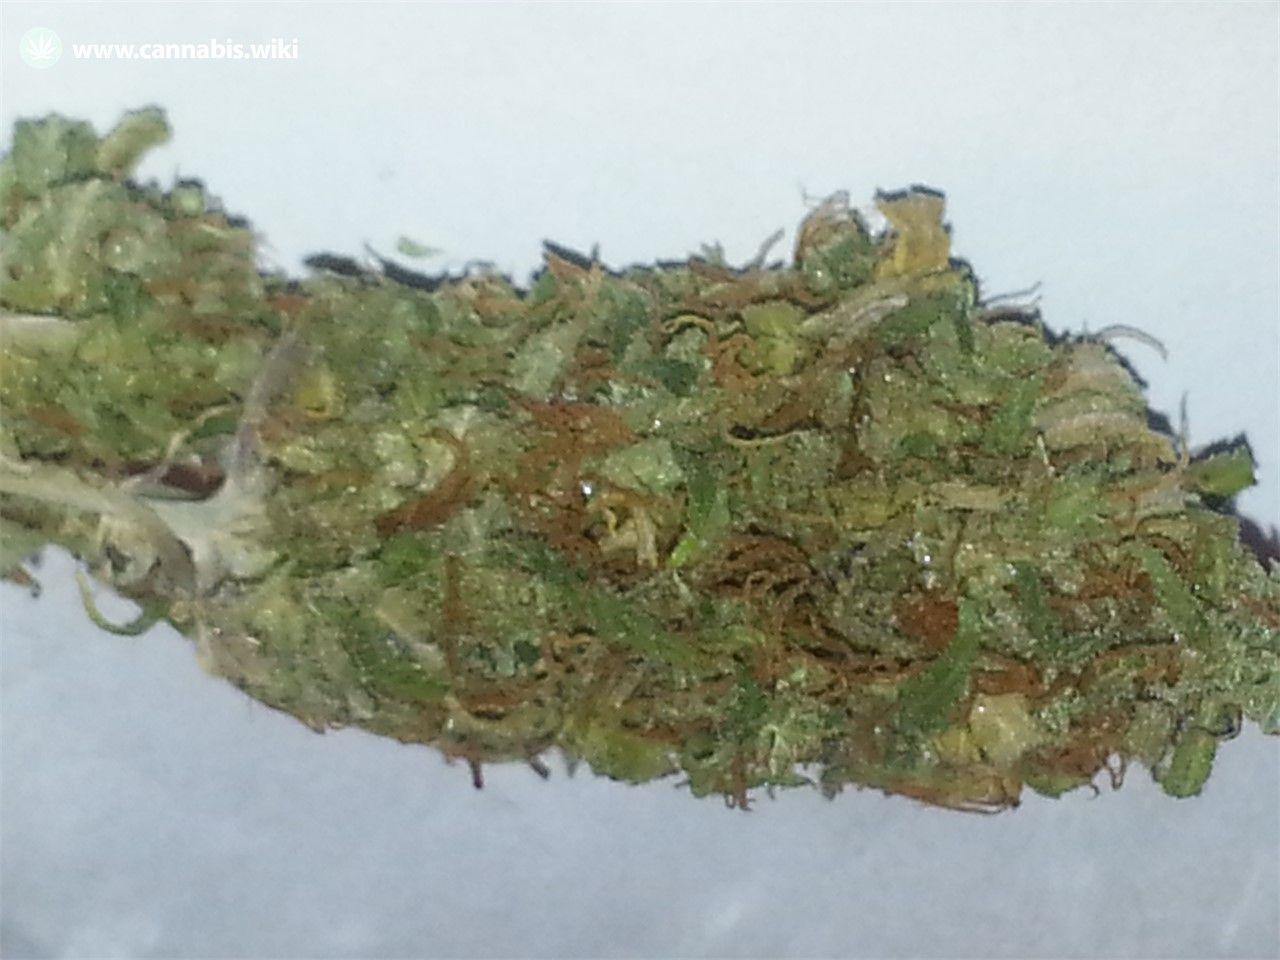 Cannabis Wiki - Strain Cherry Kola - Cka - Indica